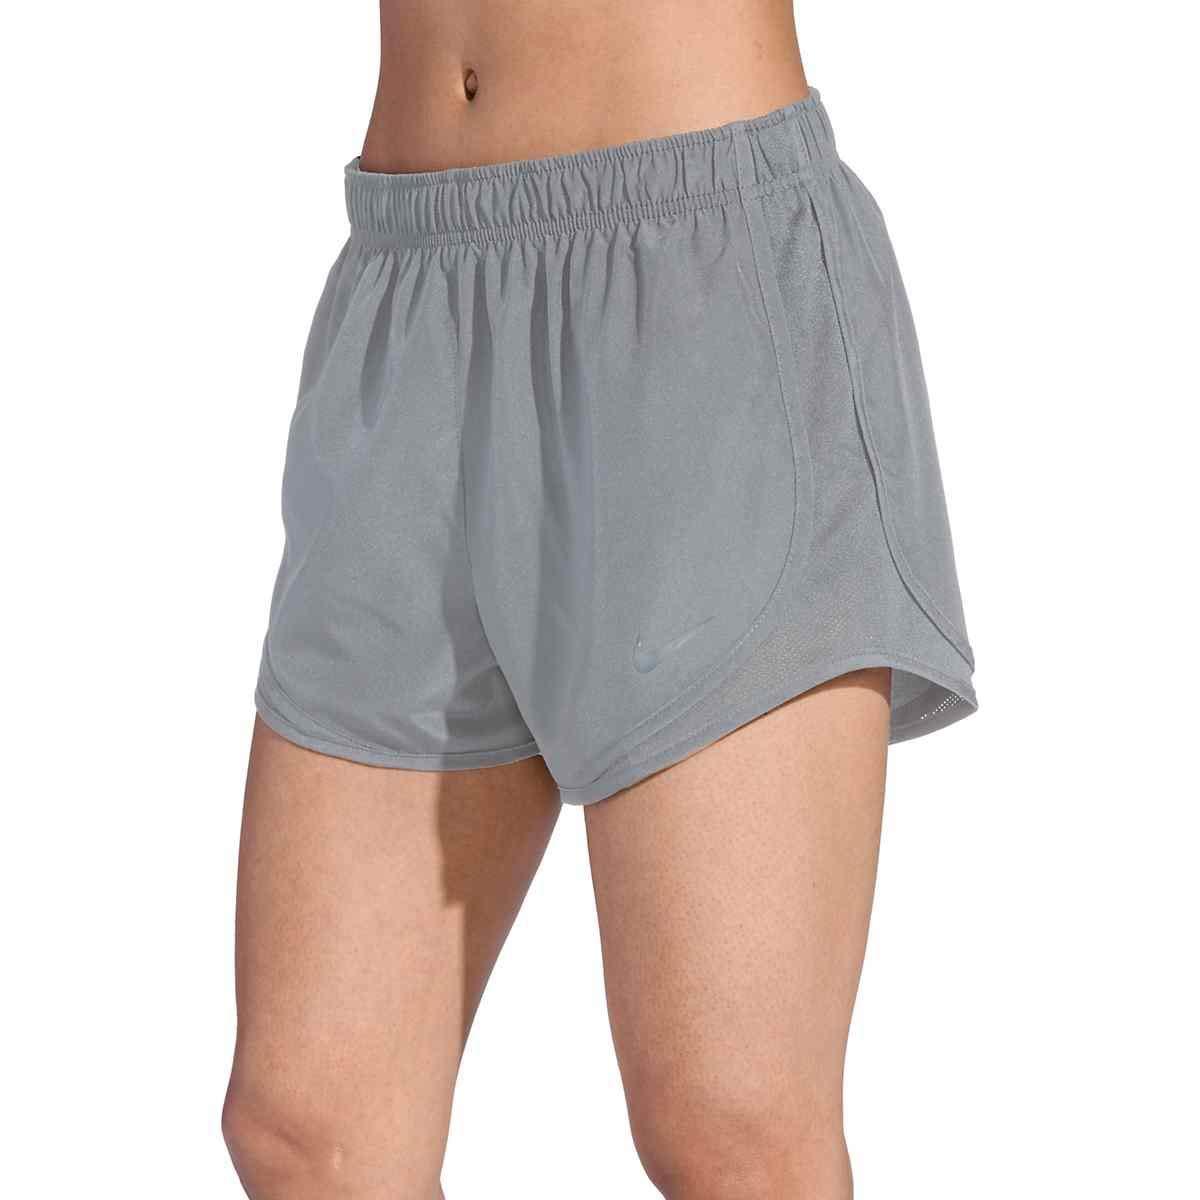 Nike Women's Tempo Running Shorts (Gunsmoke/Gunsmoke/Gunsmoke/Wolf Grey, XS